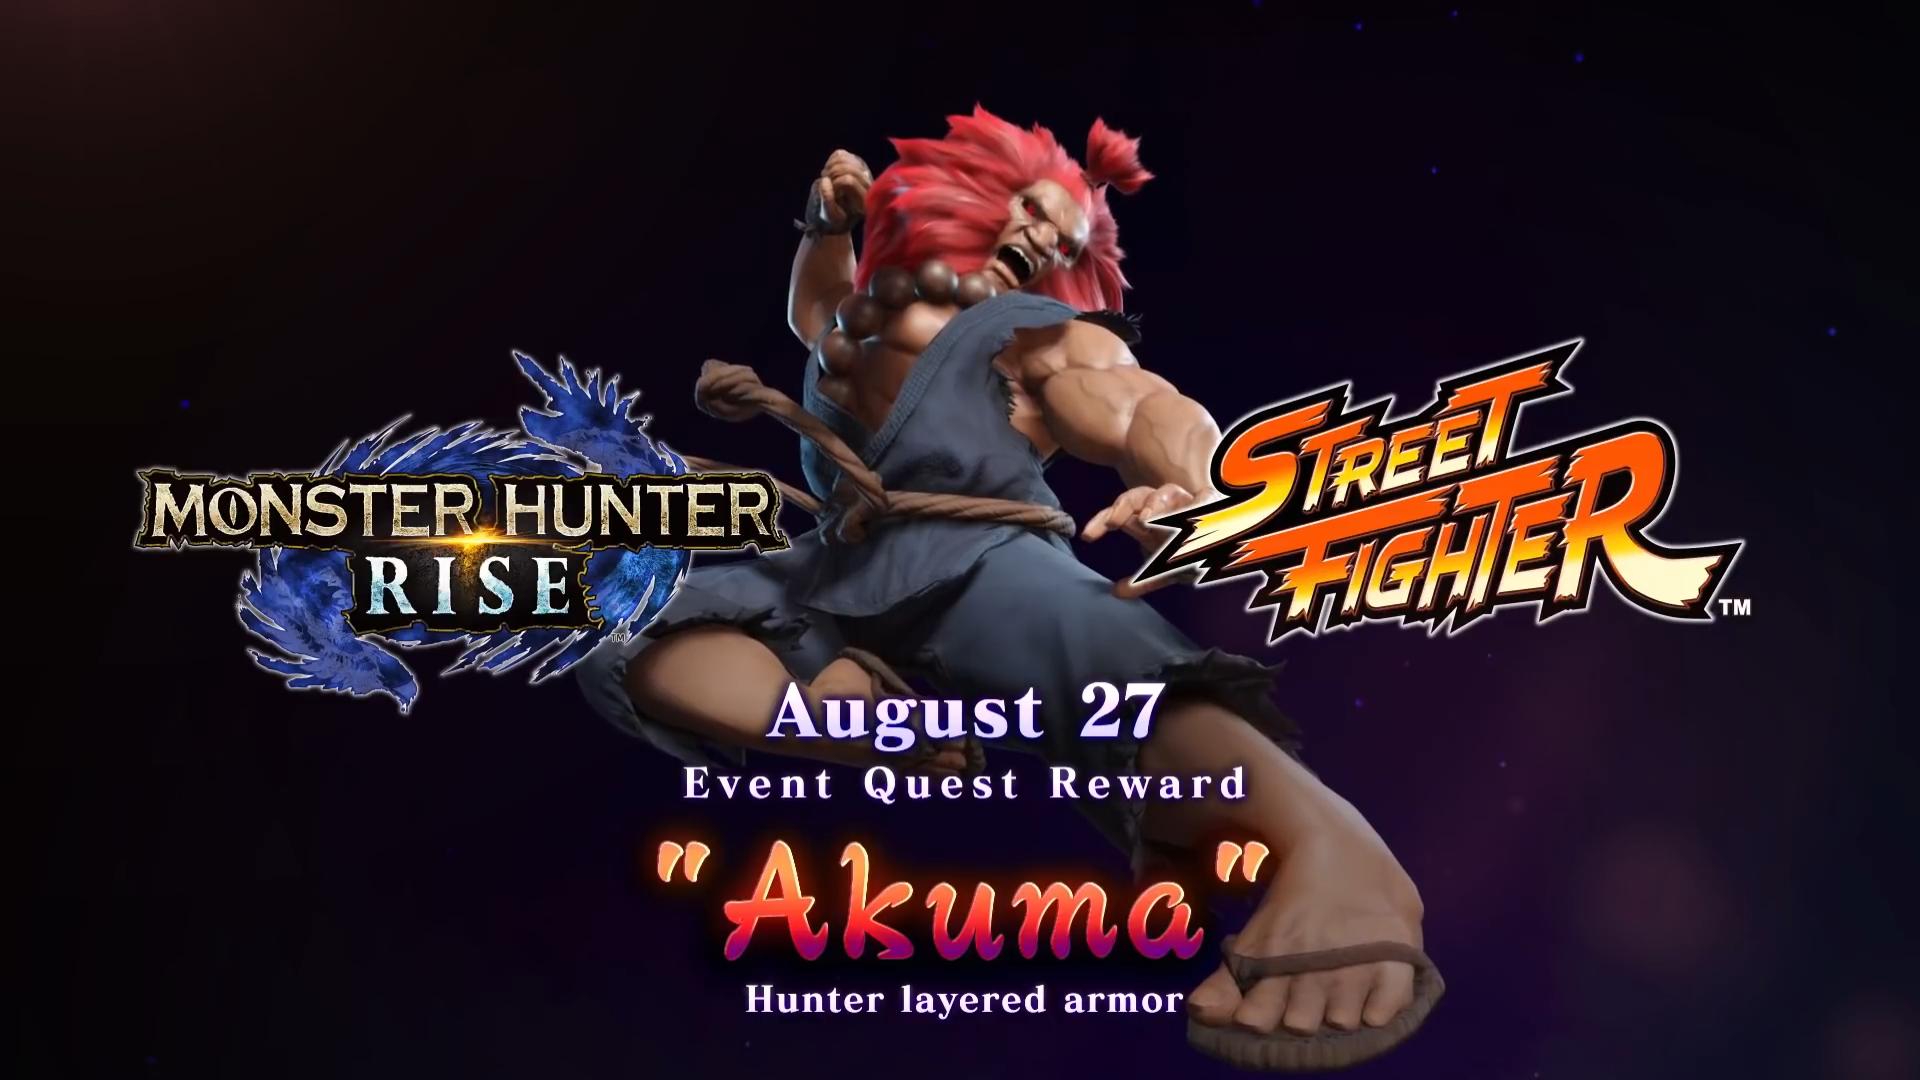 Akuma Layered Armor